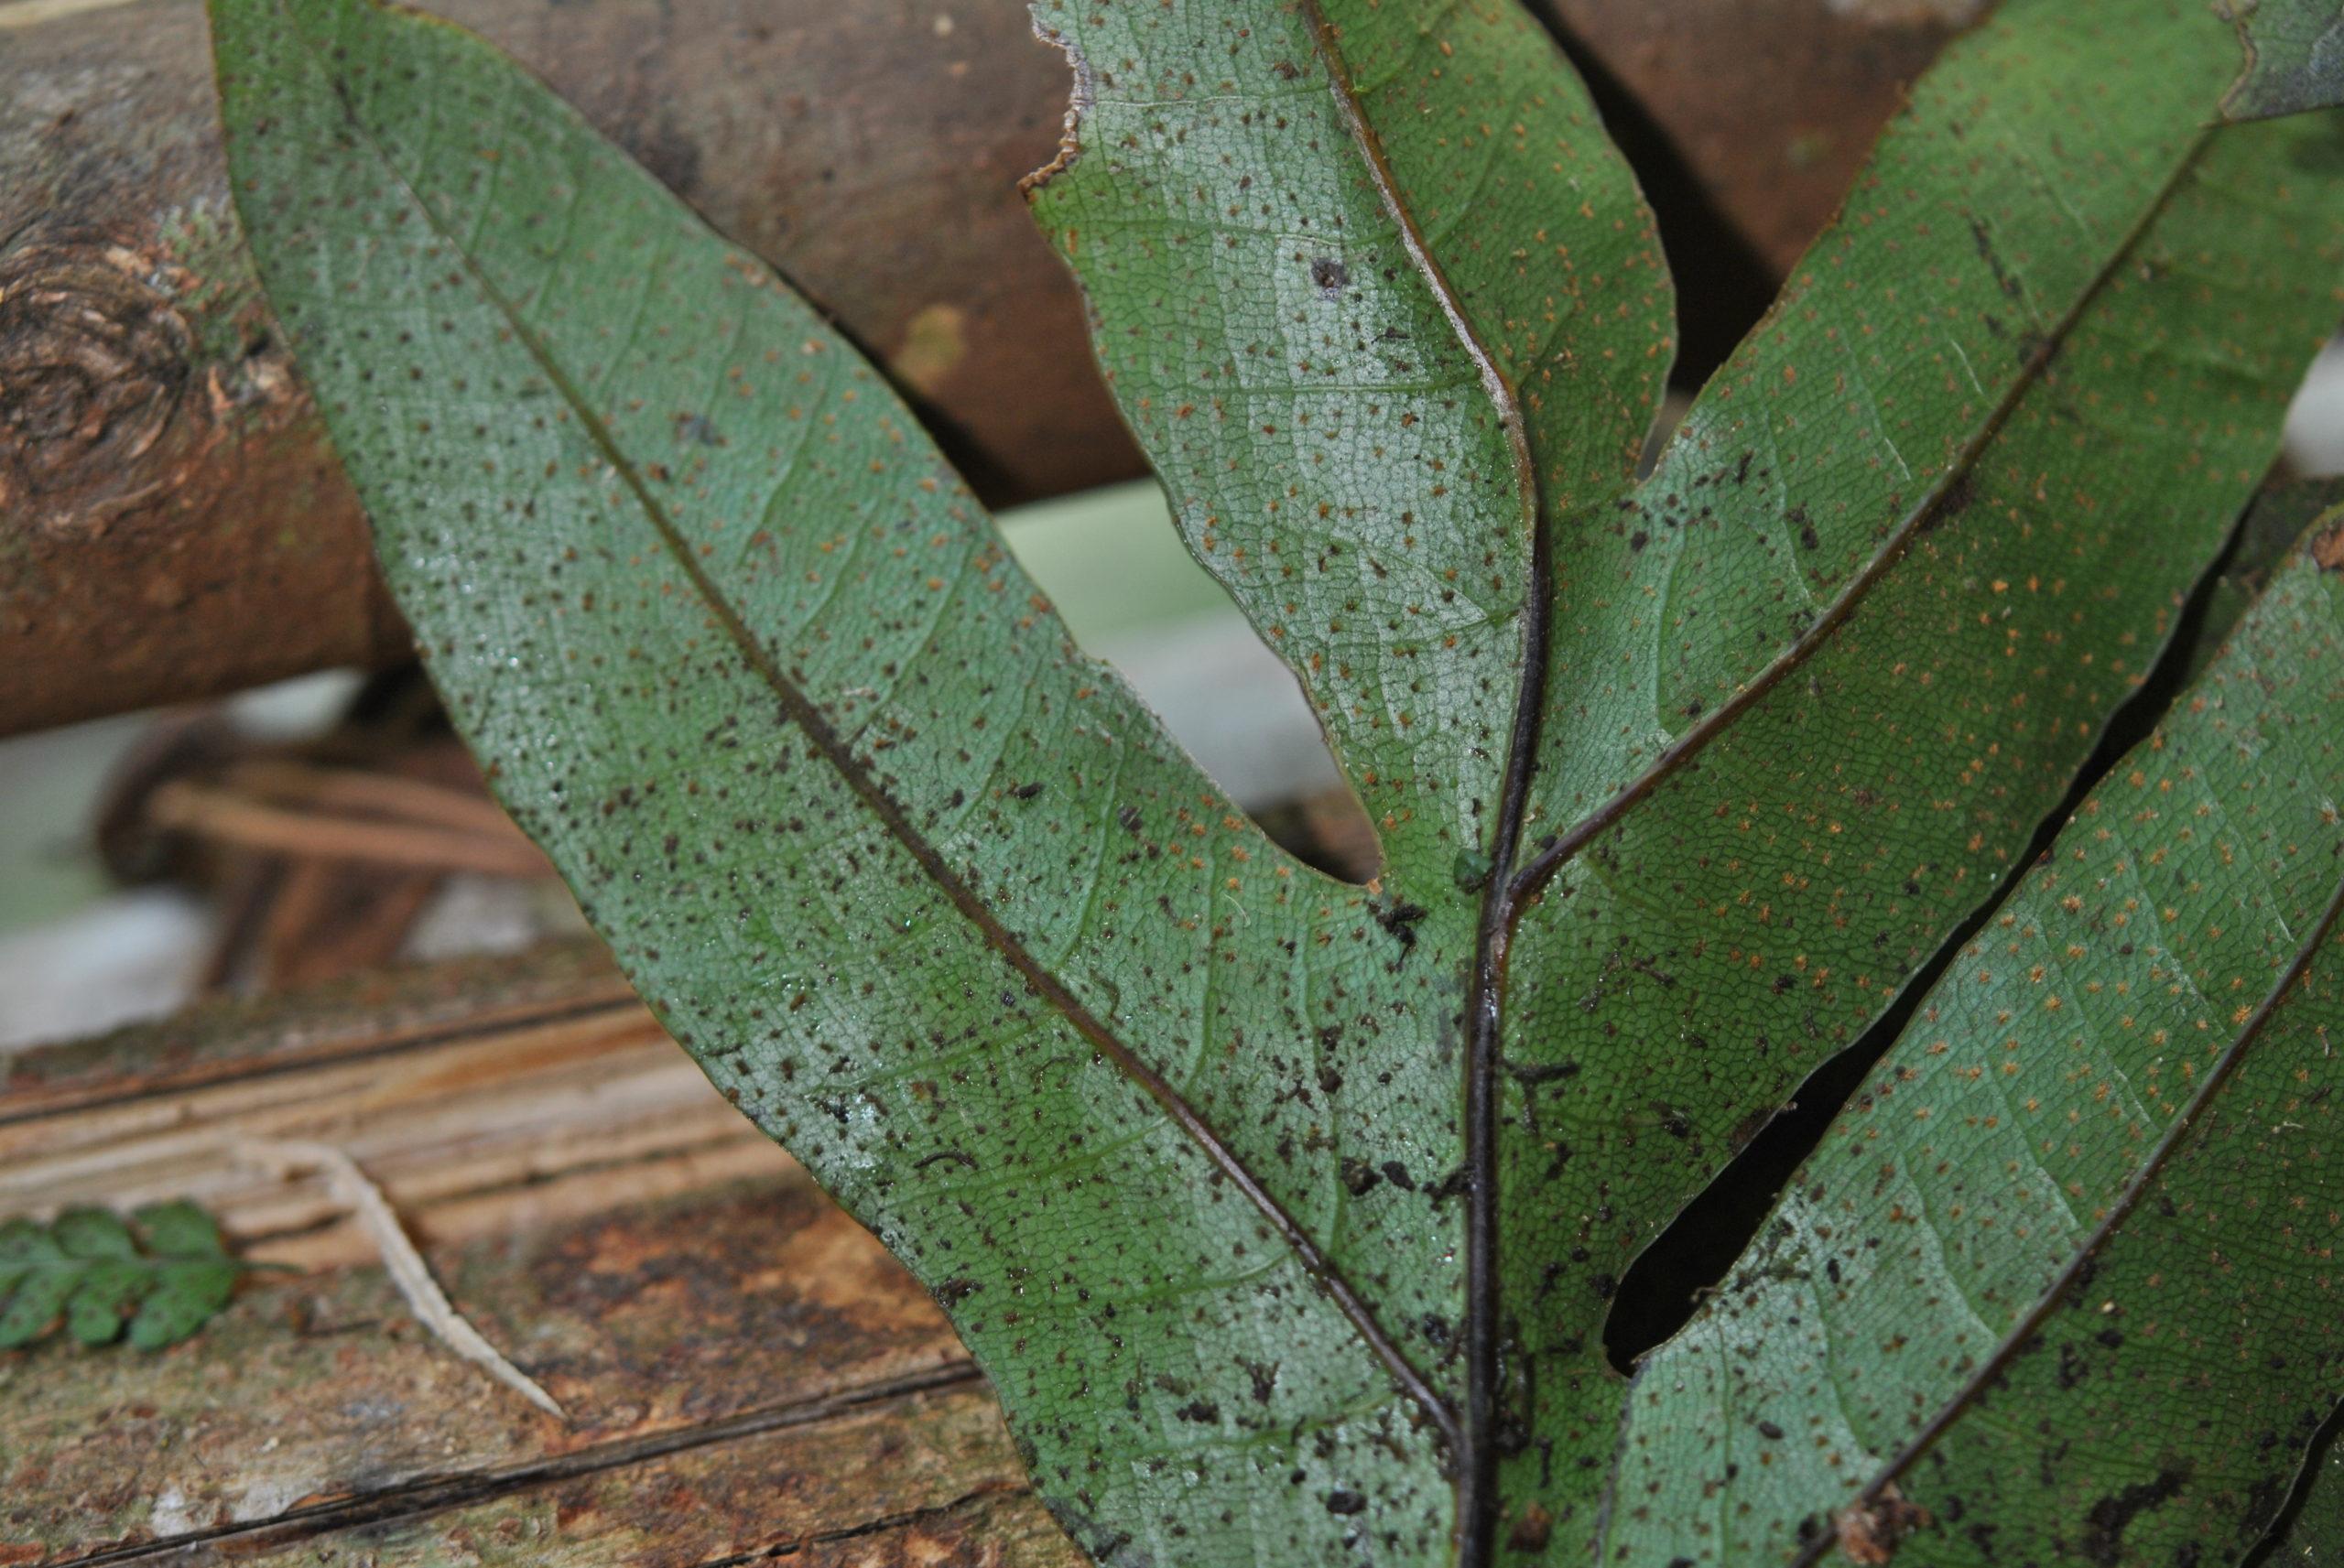 Aglaomorpha heraclea